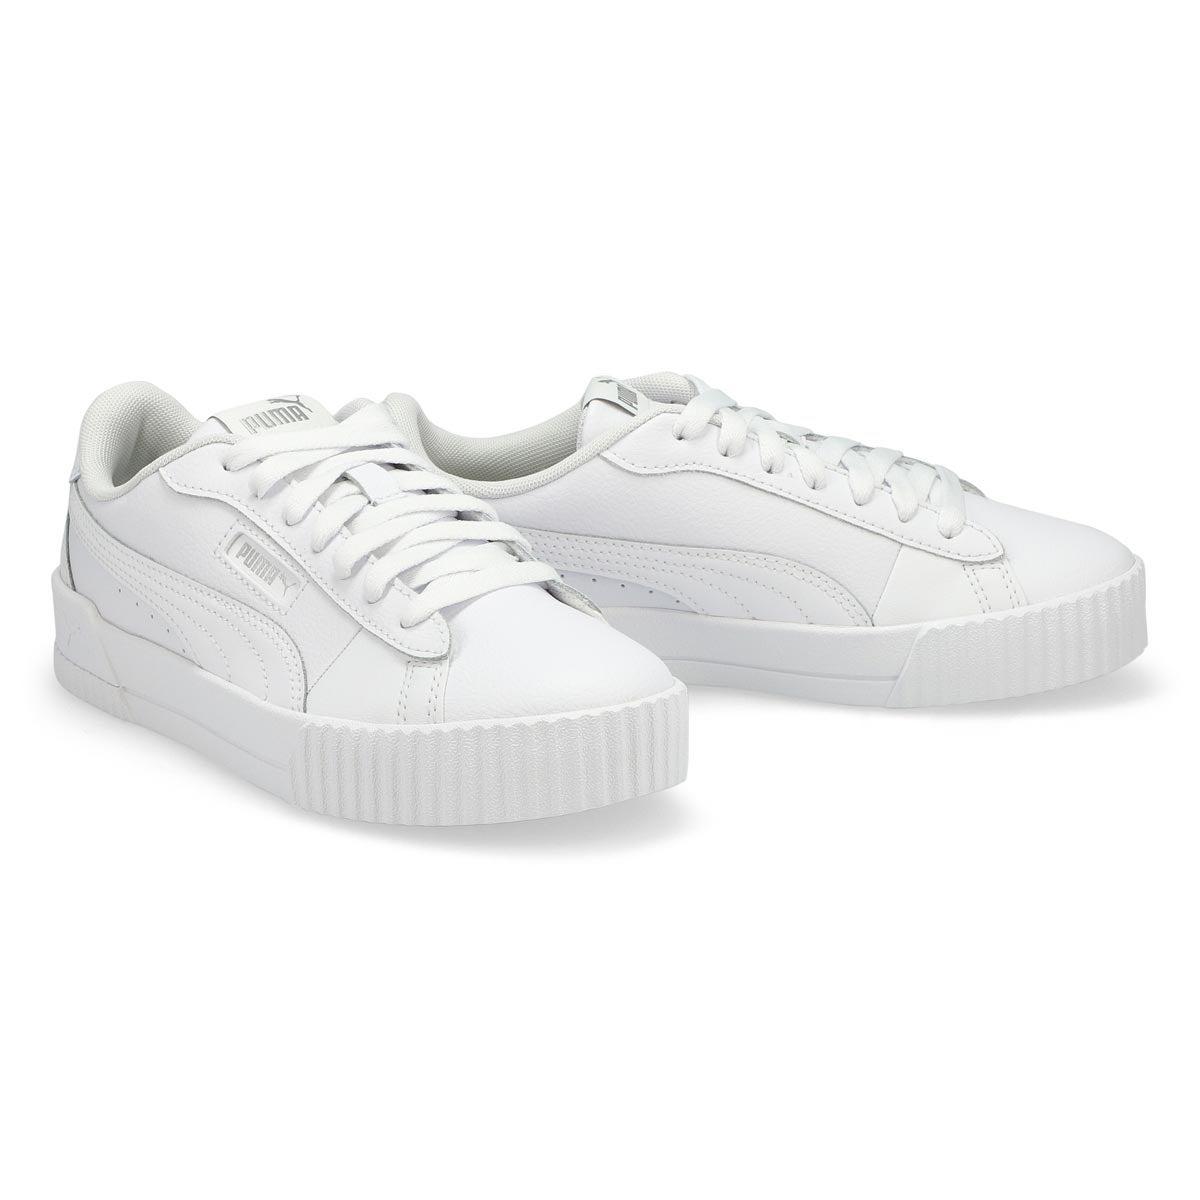 Women's Carina Crew Sneaker - White/White